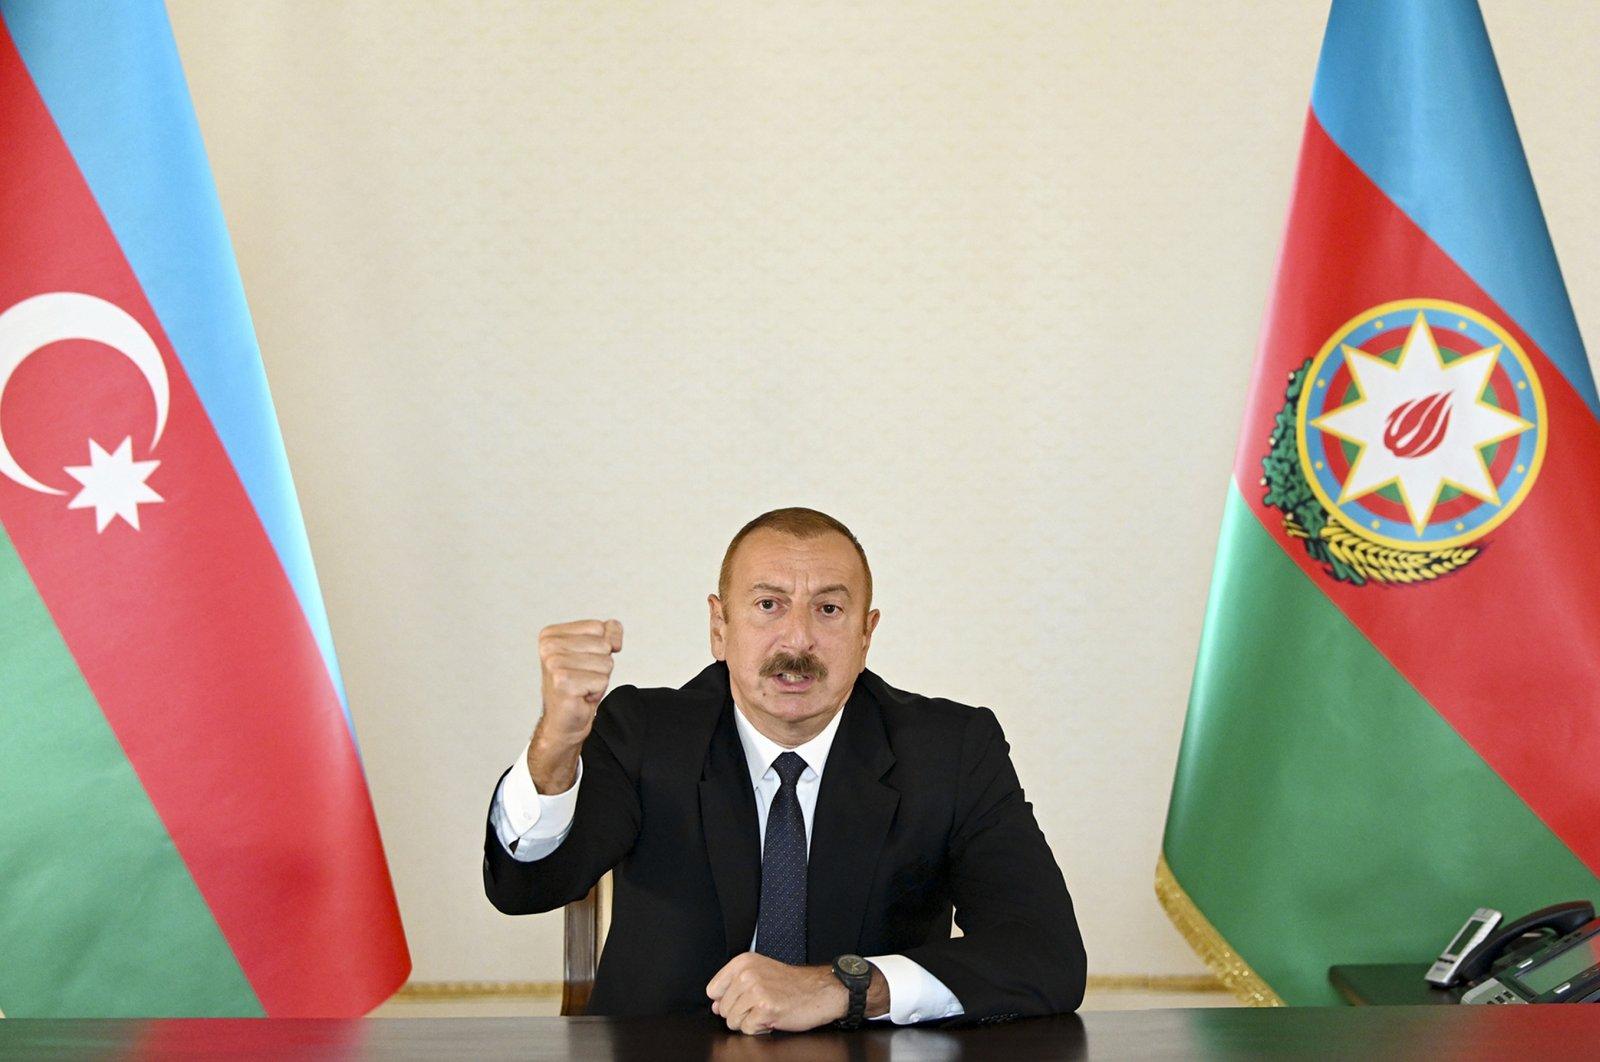 Azerbaijani President Ilham Aliyev gestures as he addresses the nation in Baku, Azerbaijan, Sept. 27, 2020. (Azerbaijani Presidential Press Office via AP)